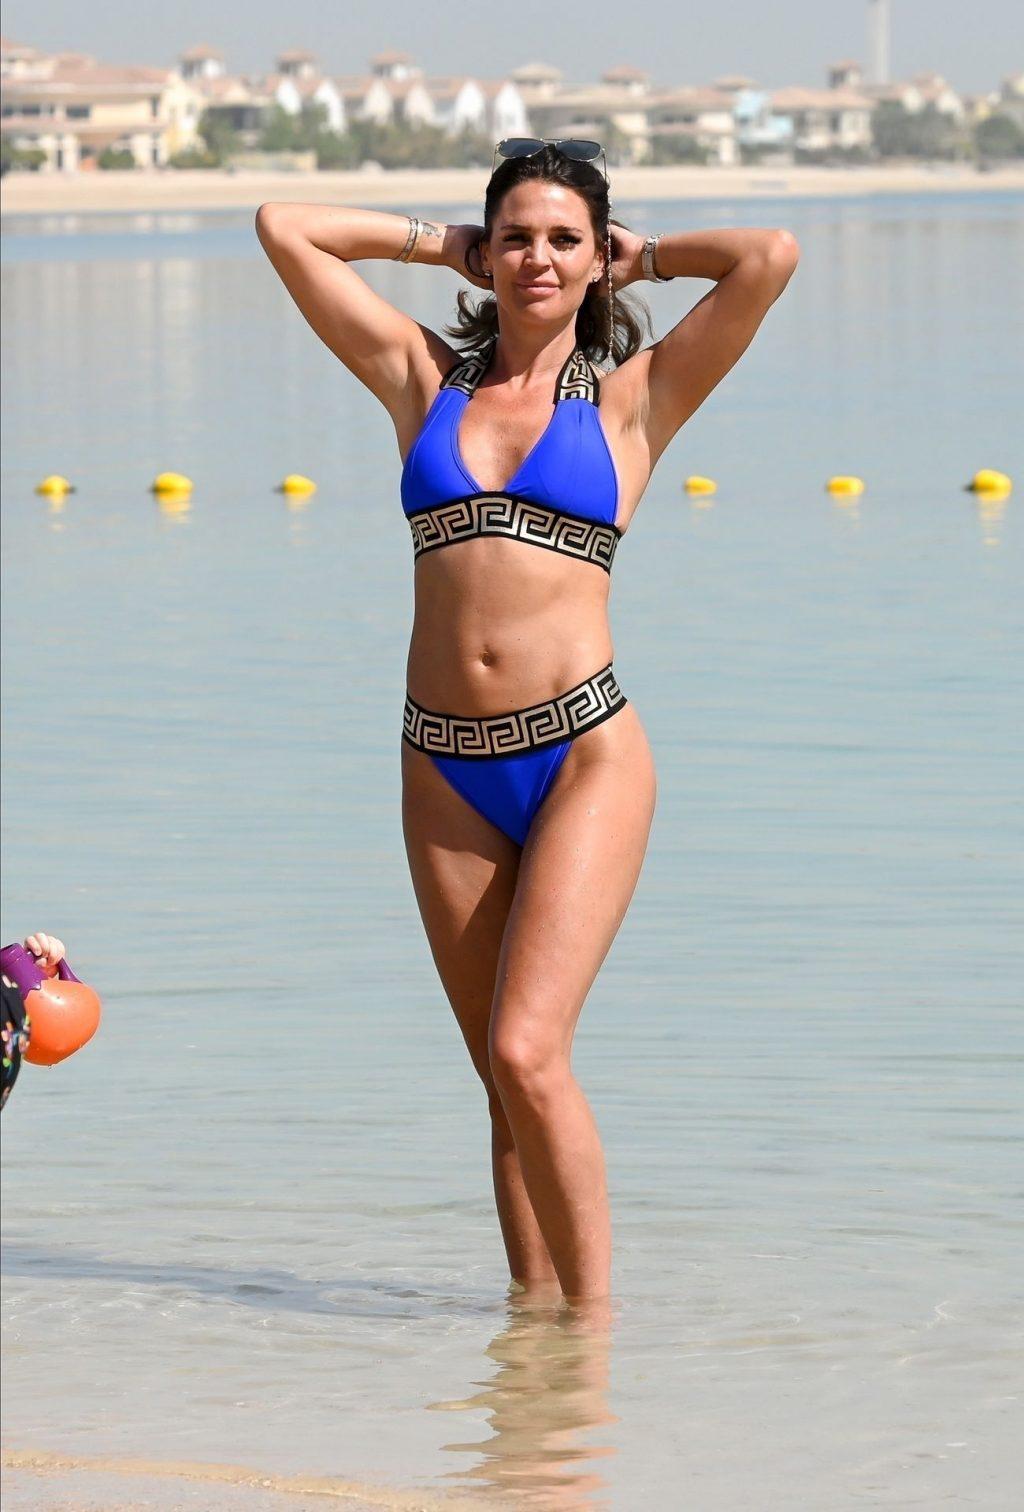 Sexy Model Danielle Lloyd is Seen On a Family Break in Dubai (33 Photos)